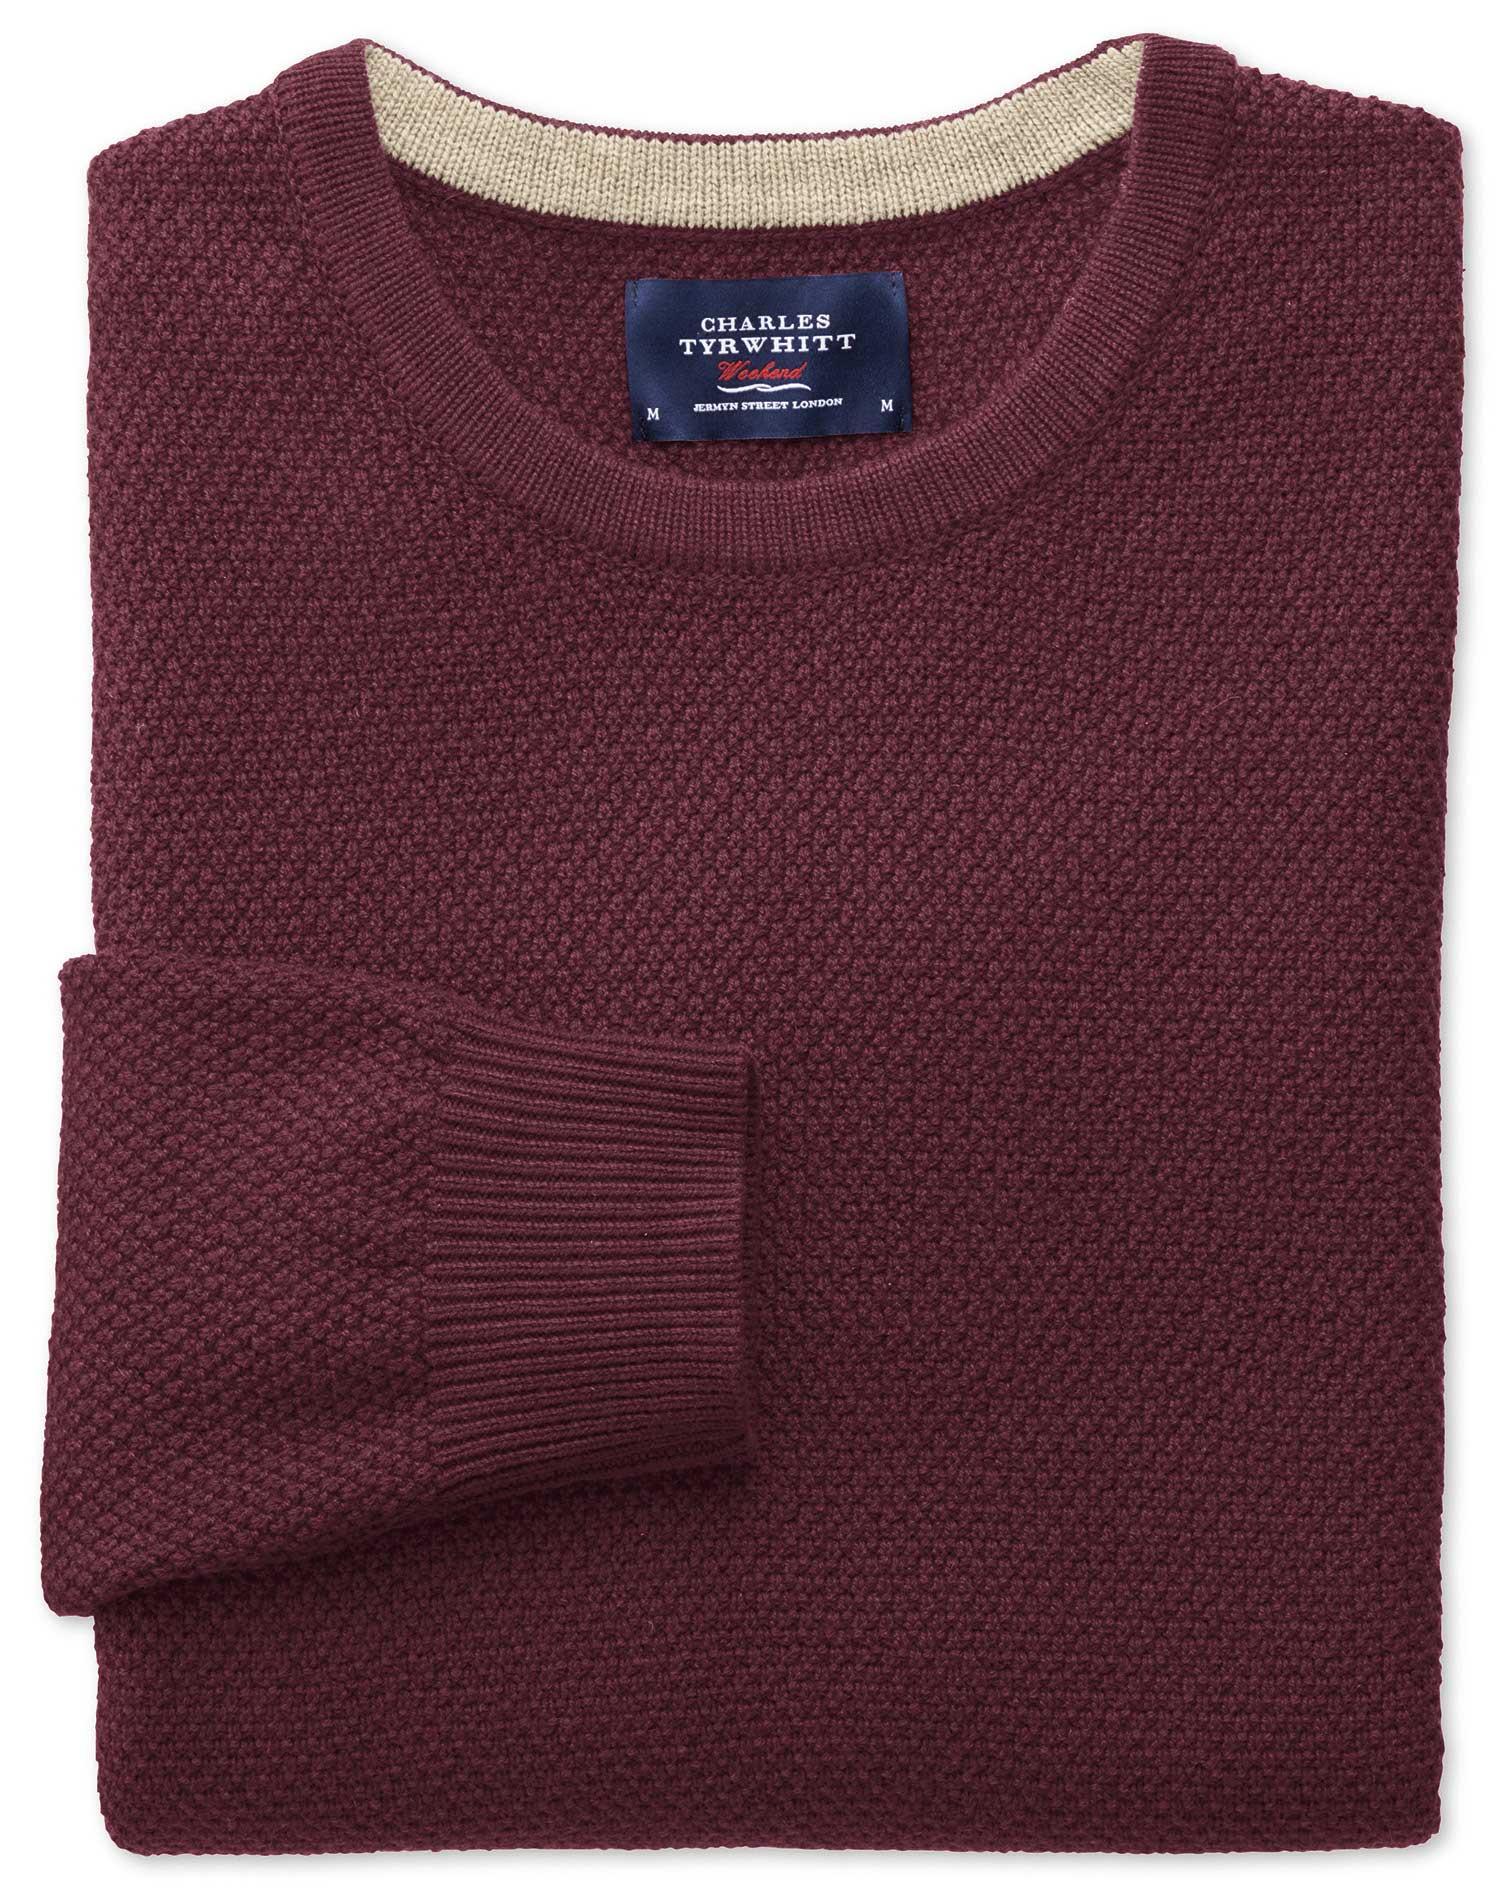 Wine Merino Cotton Crew Neck Wool Jumper Size XXXL by Charles Tyrwhitt